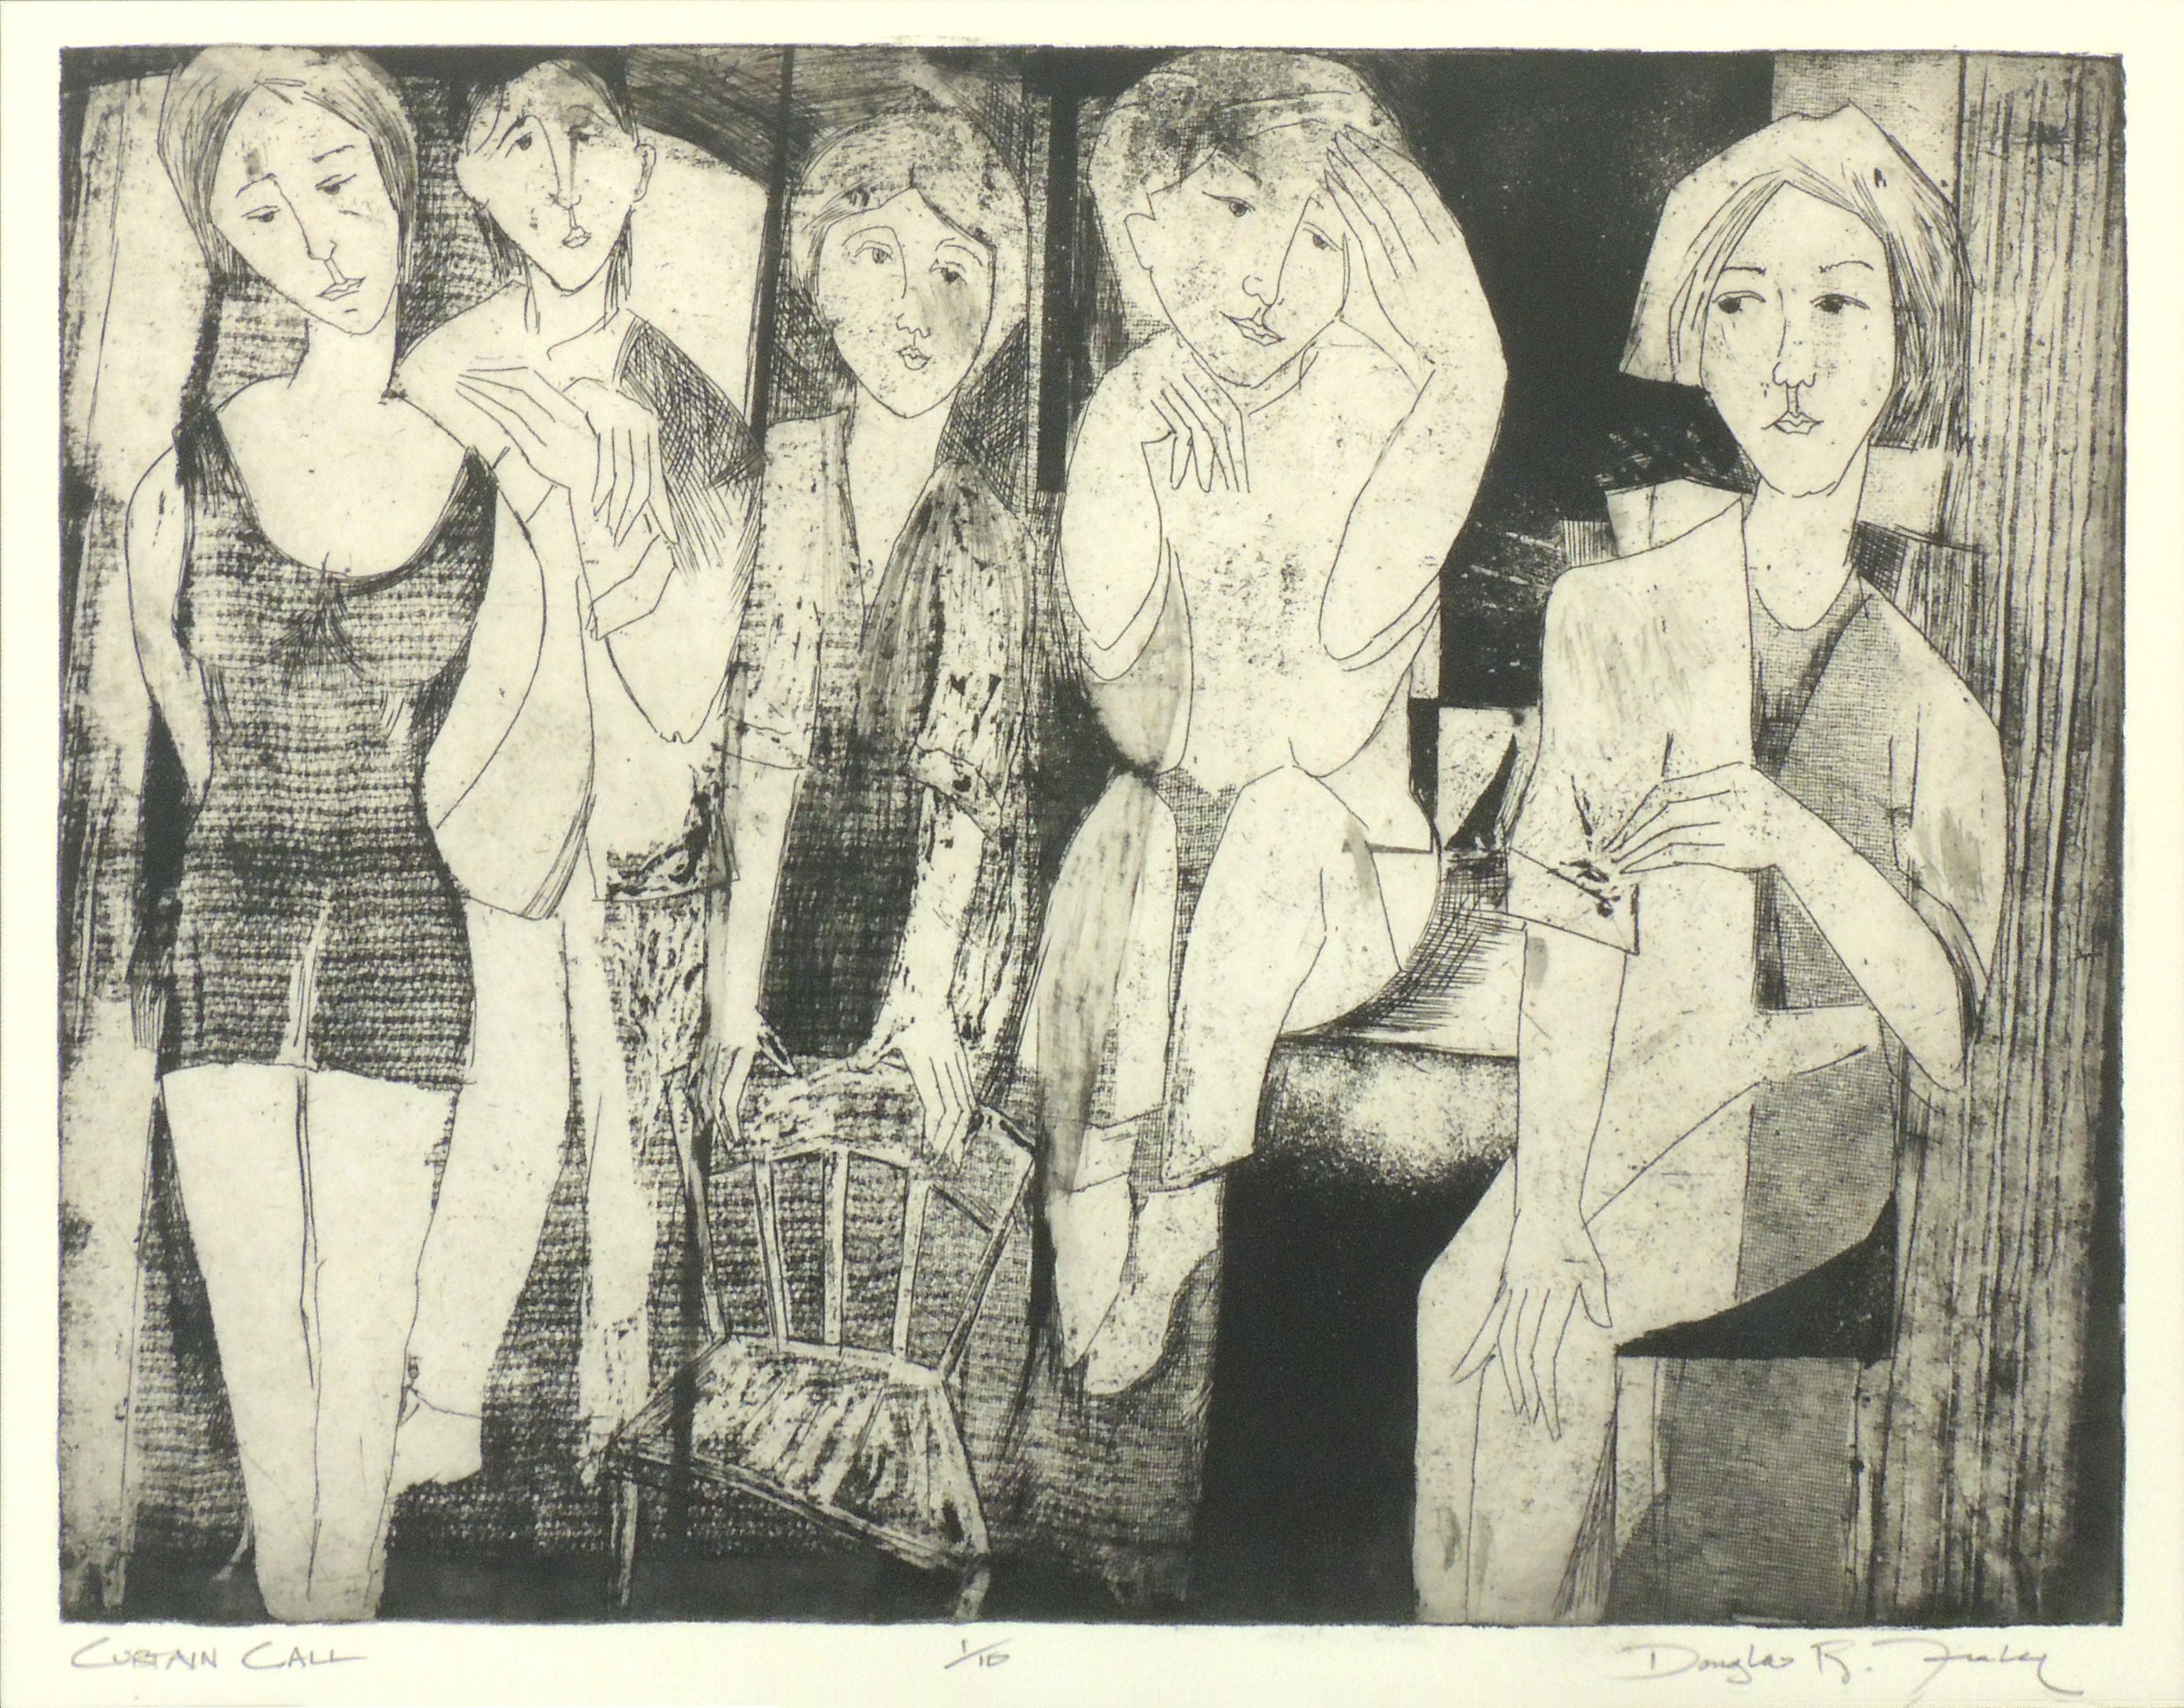 Douglas R. Fiely | CURTAIN CALL | Intaglio print